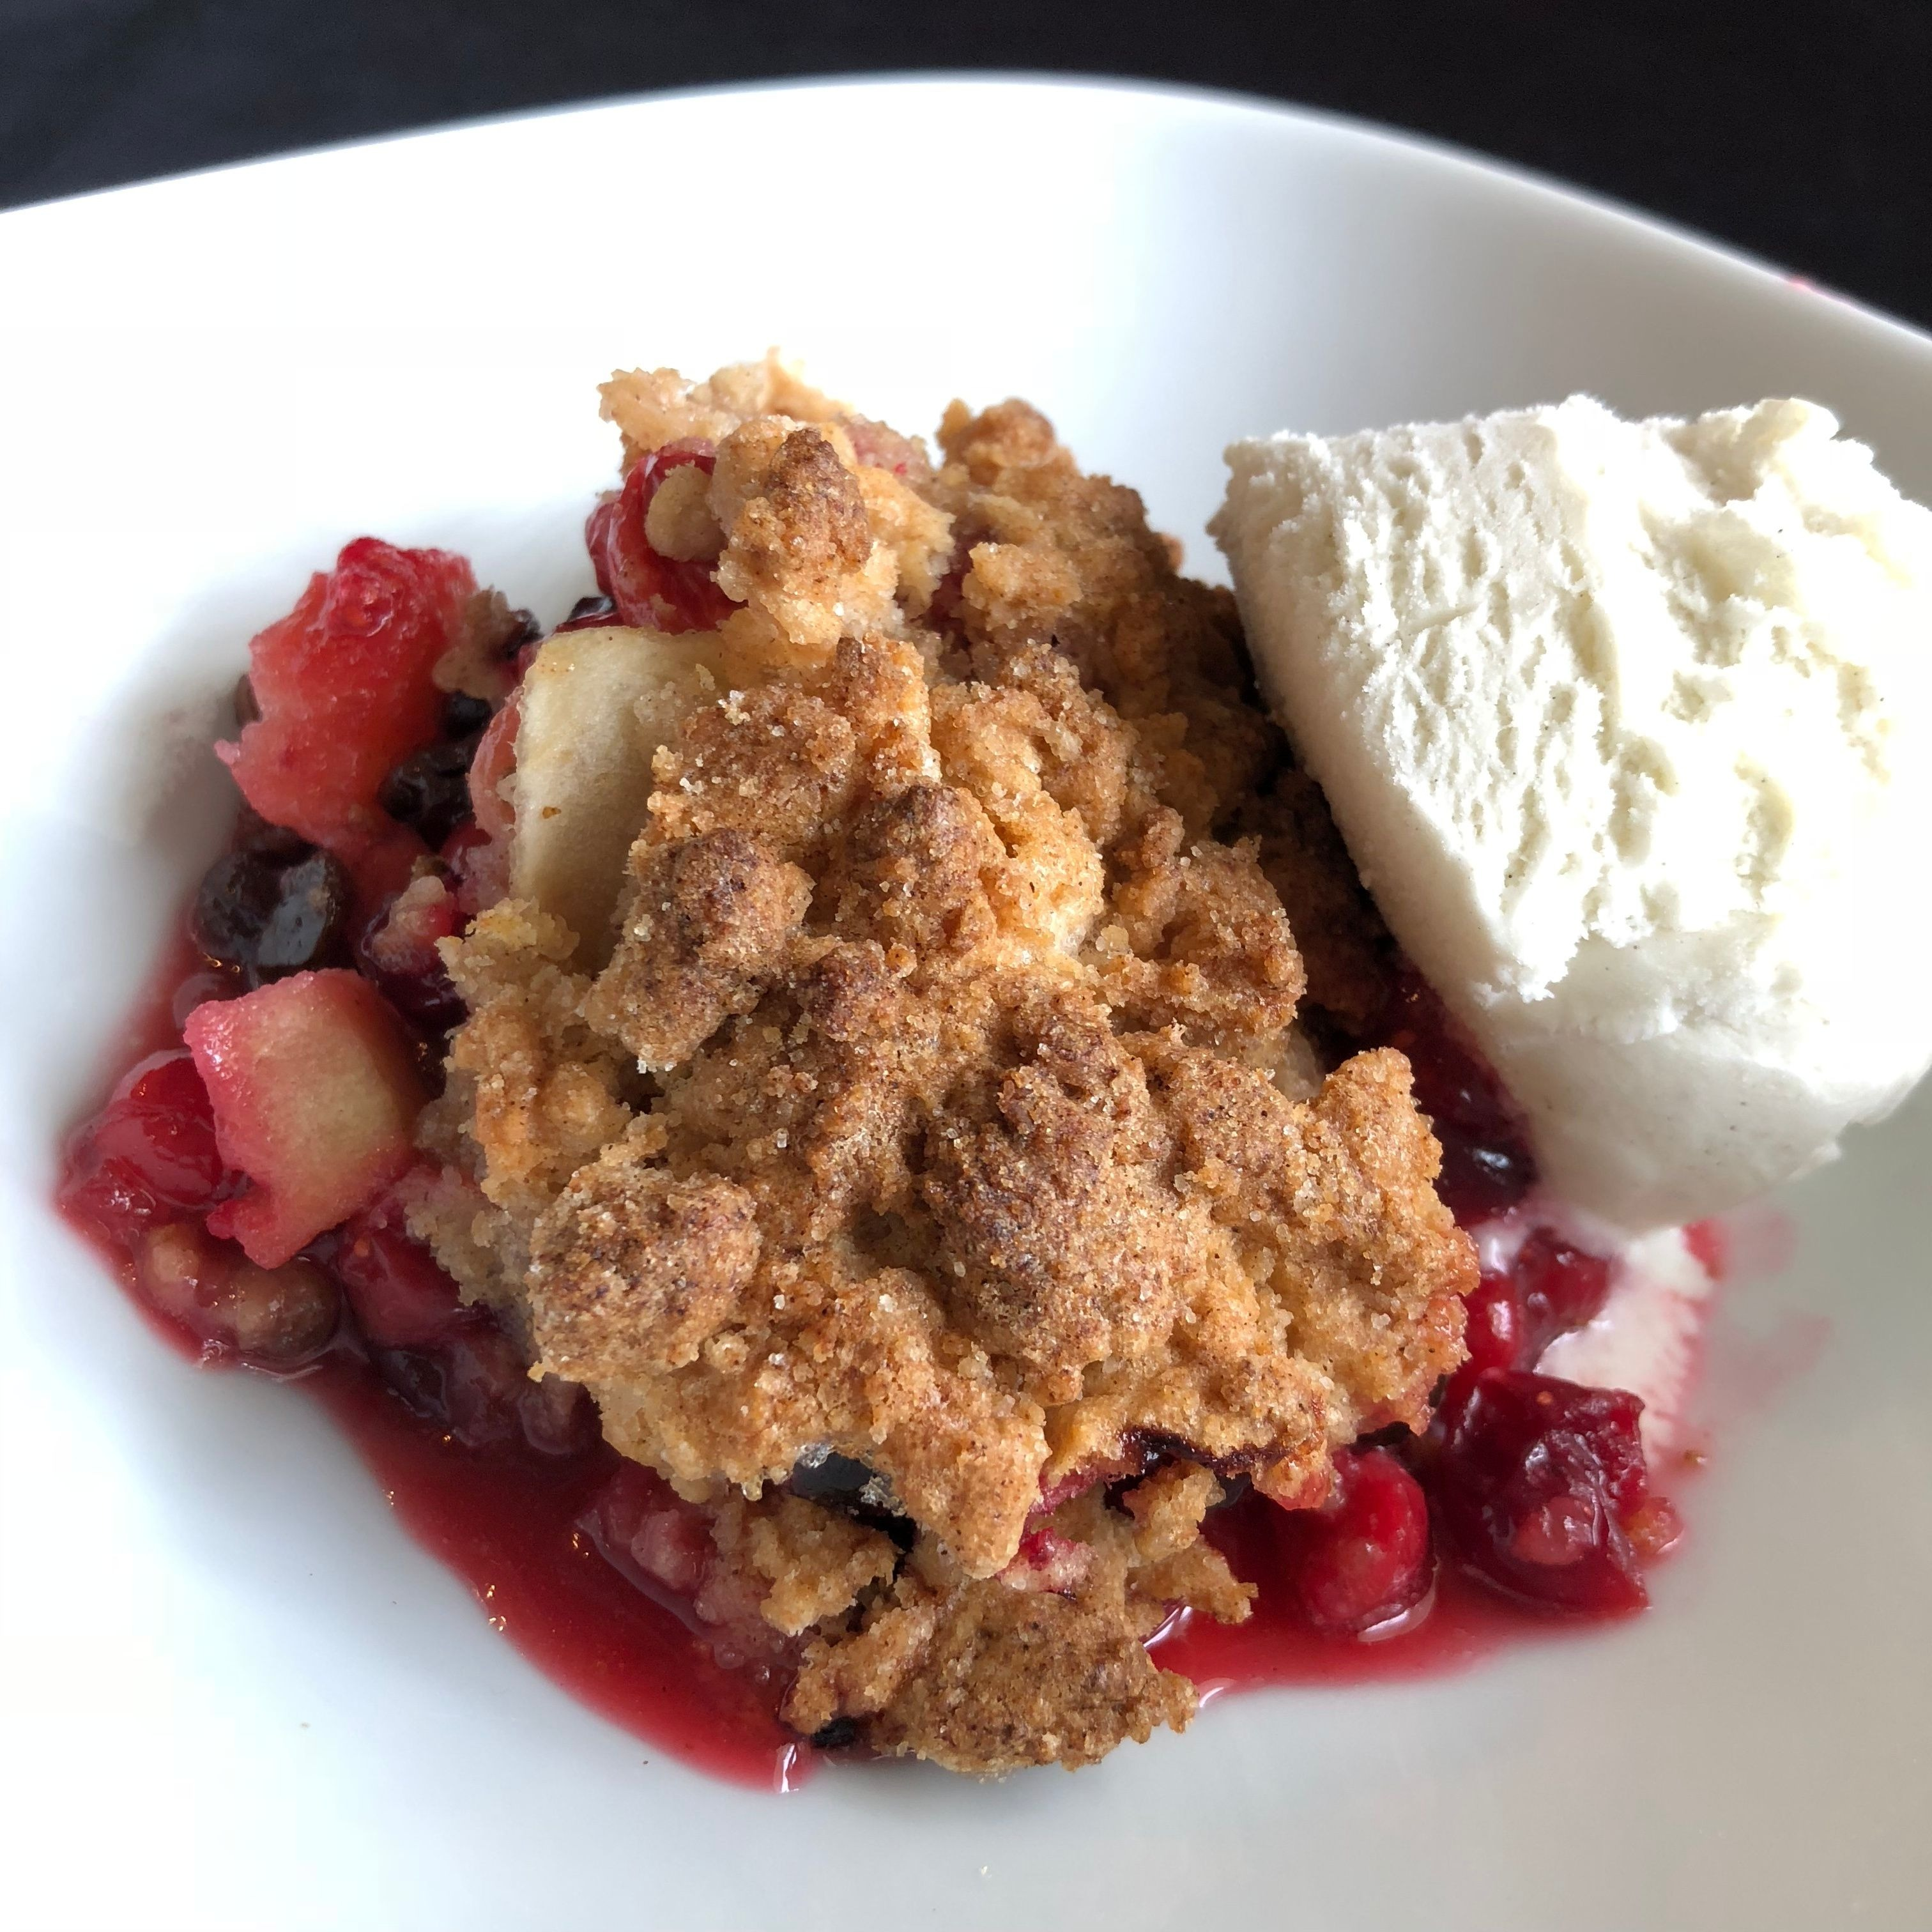 Apple-Cranberry Crumble image